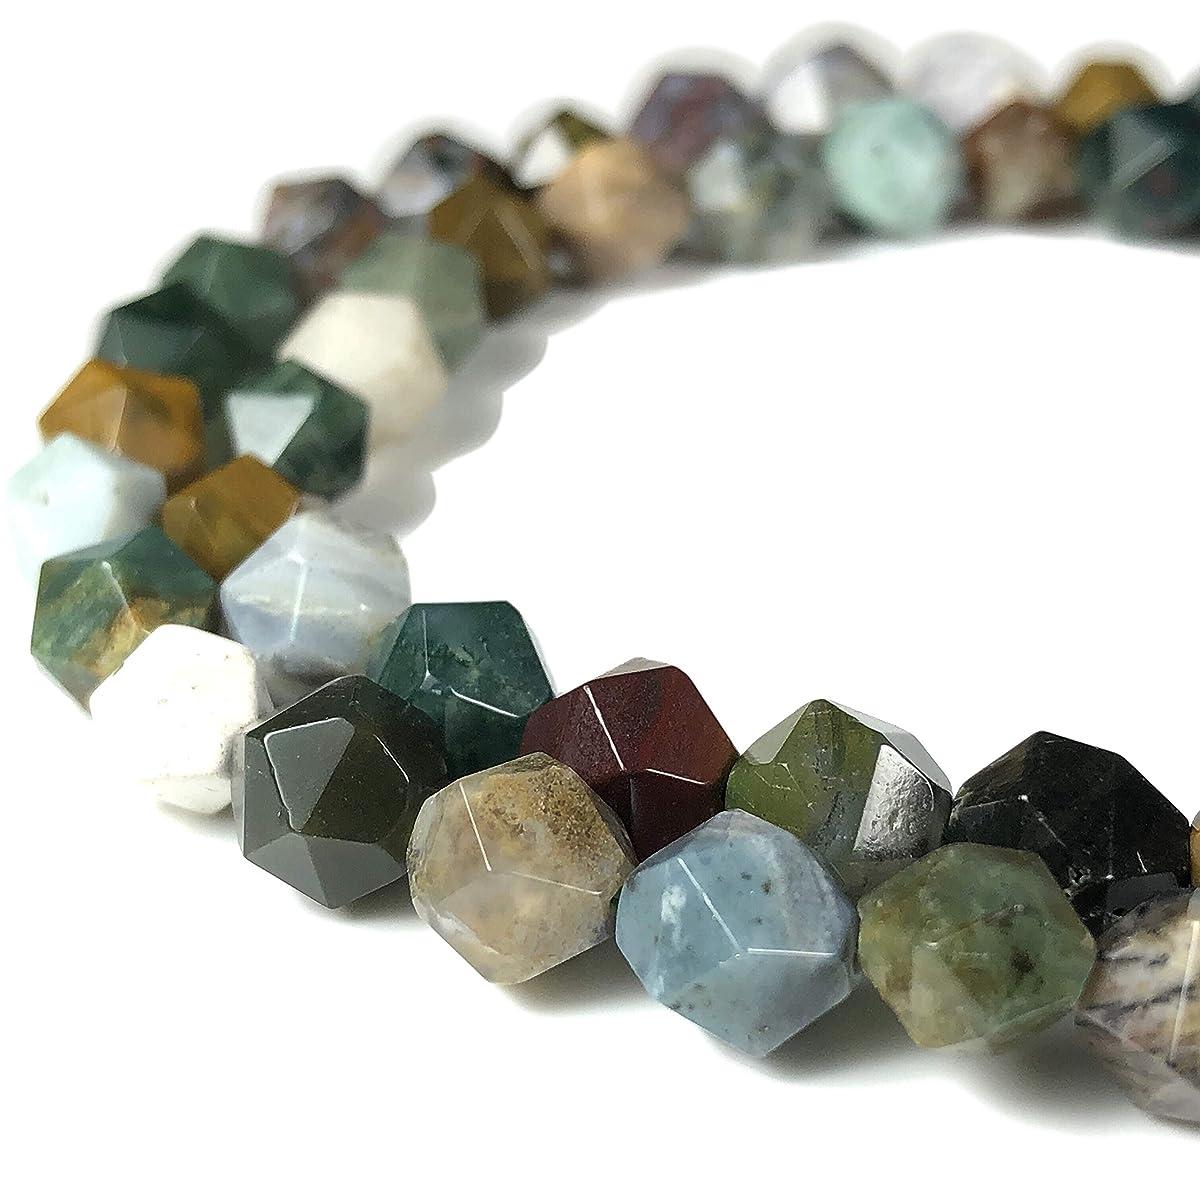 [ABCgems] Madagascan Ocean Jasper 8mm Precision-Star-Cut Beads for Beading & Jewelry Making